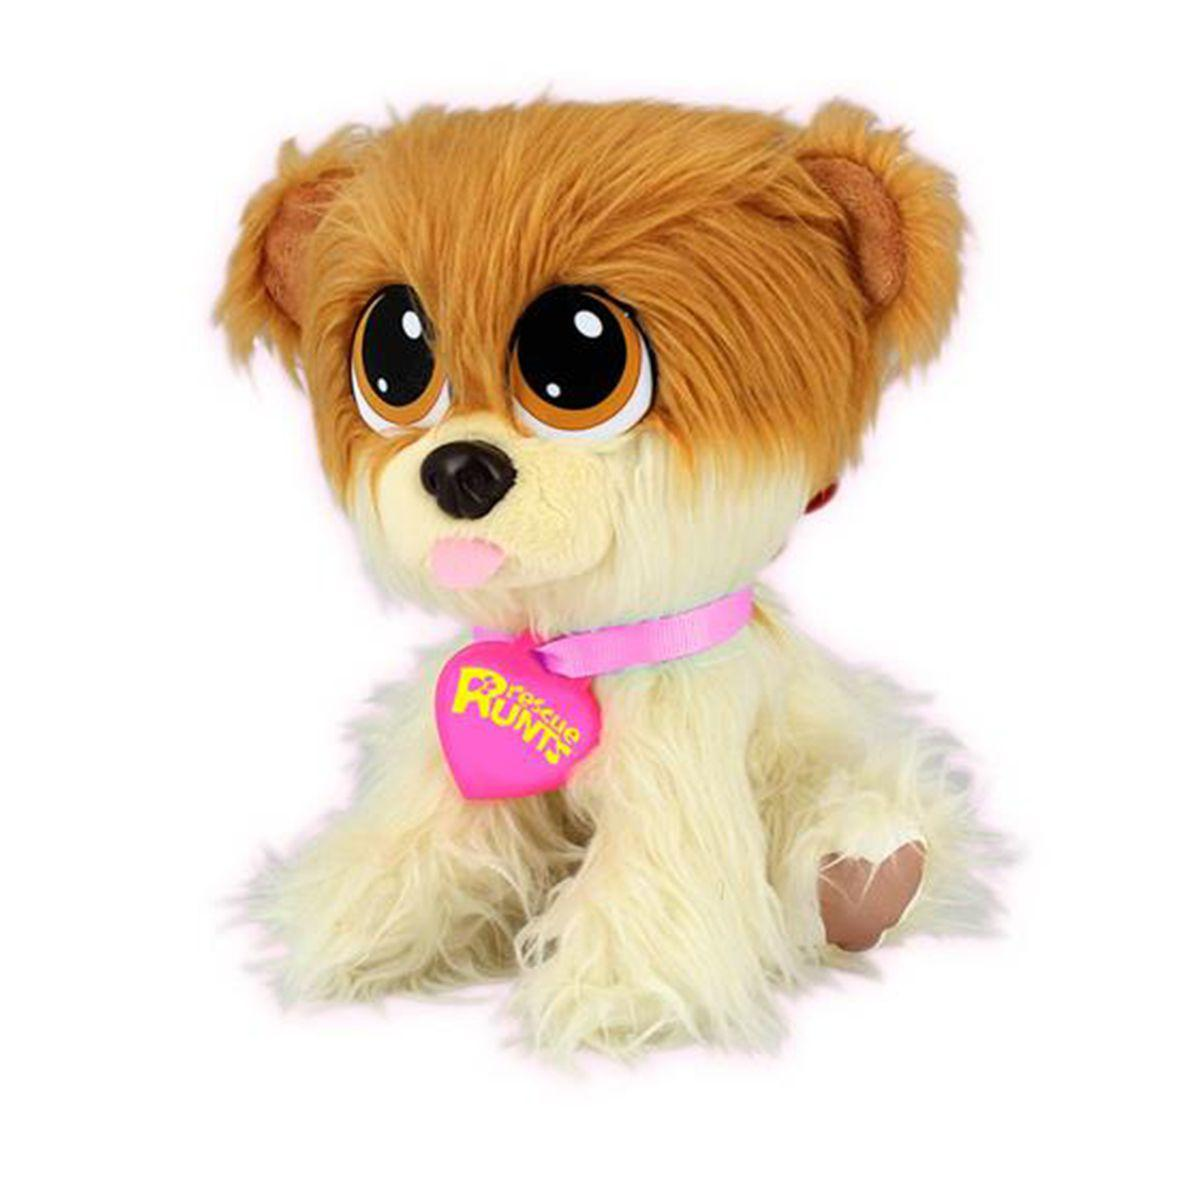 Adota Pets Lulu 19cm Com Acessórios - Multikids